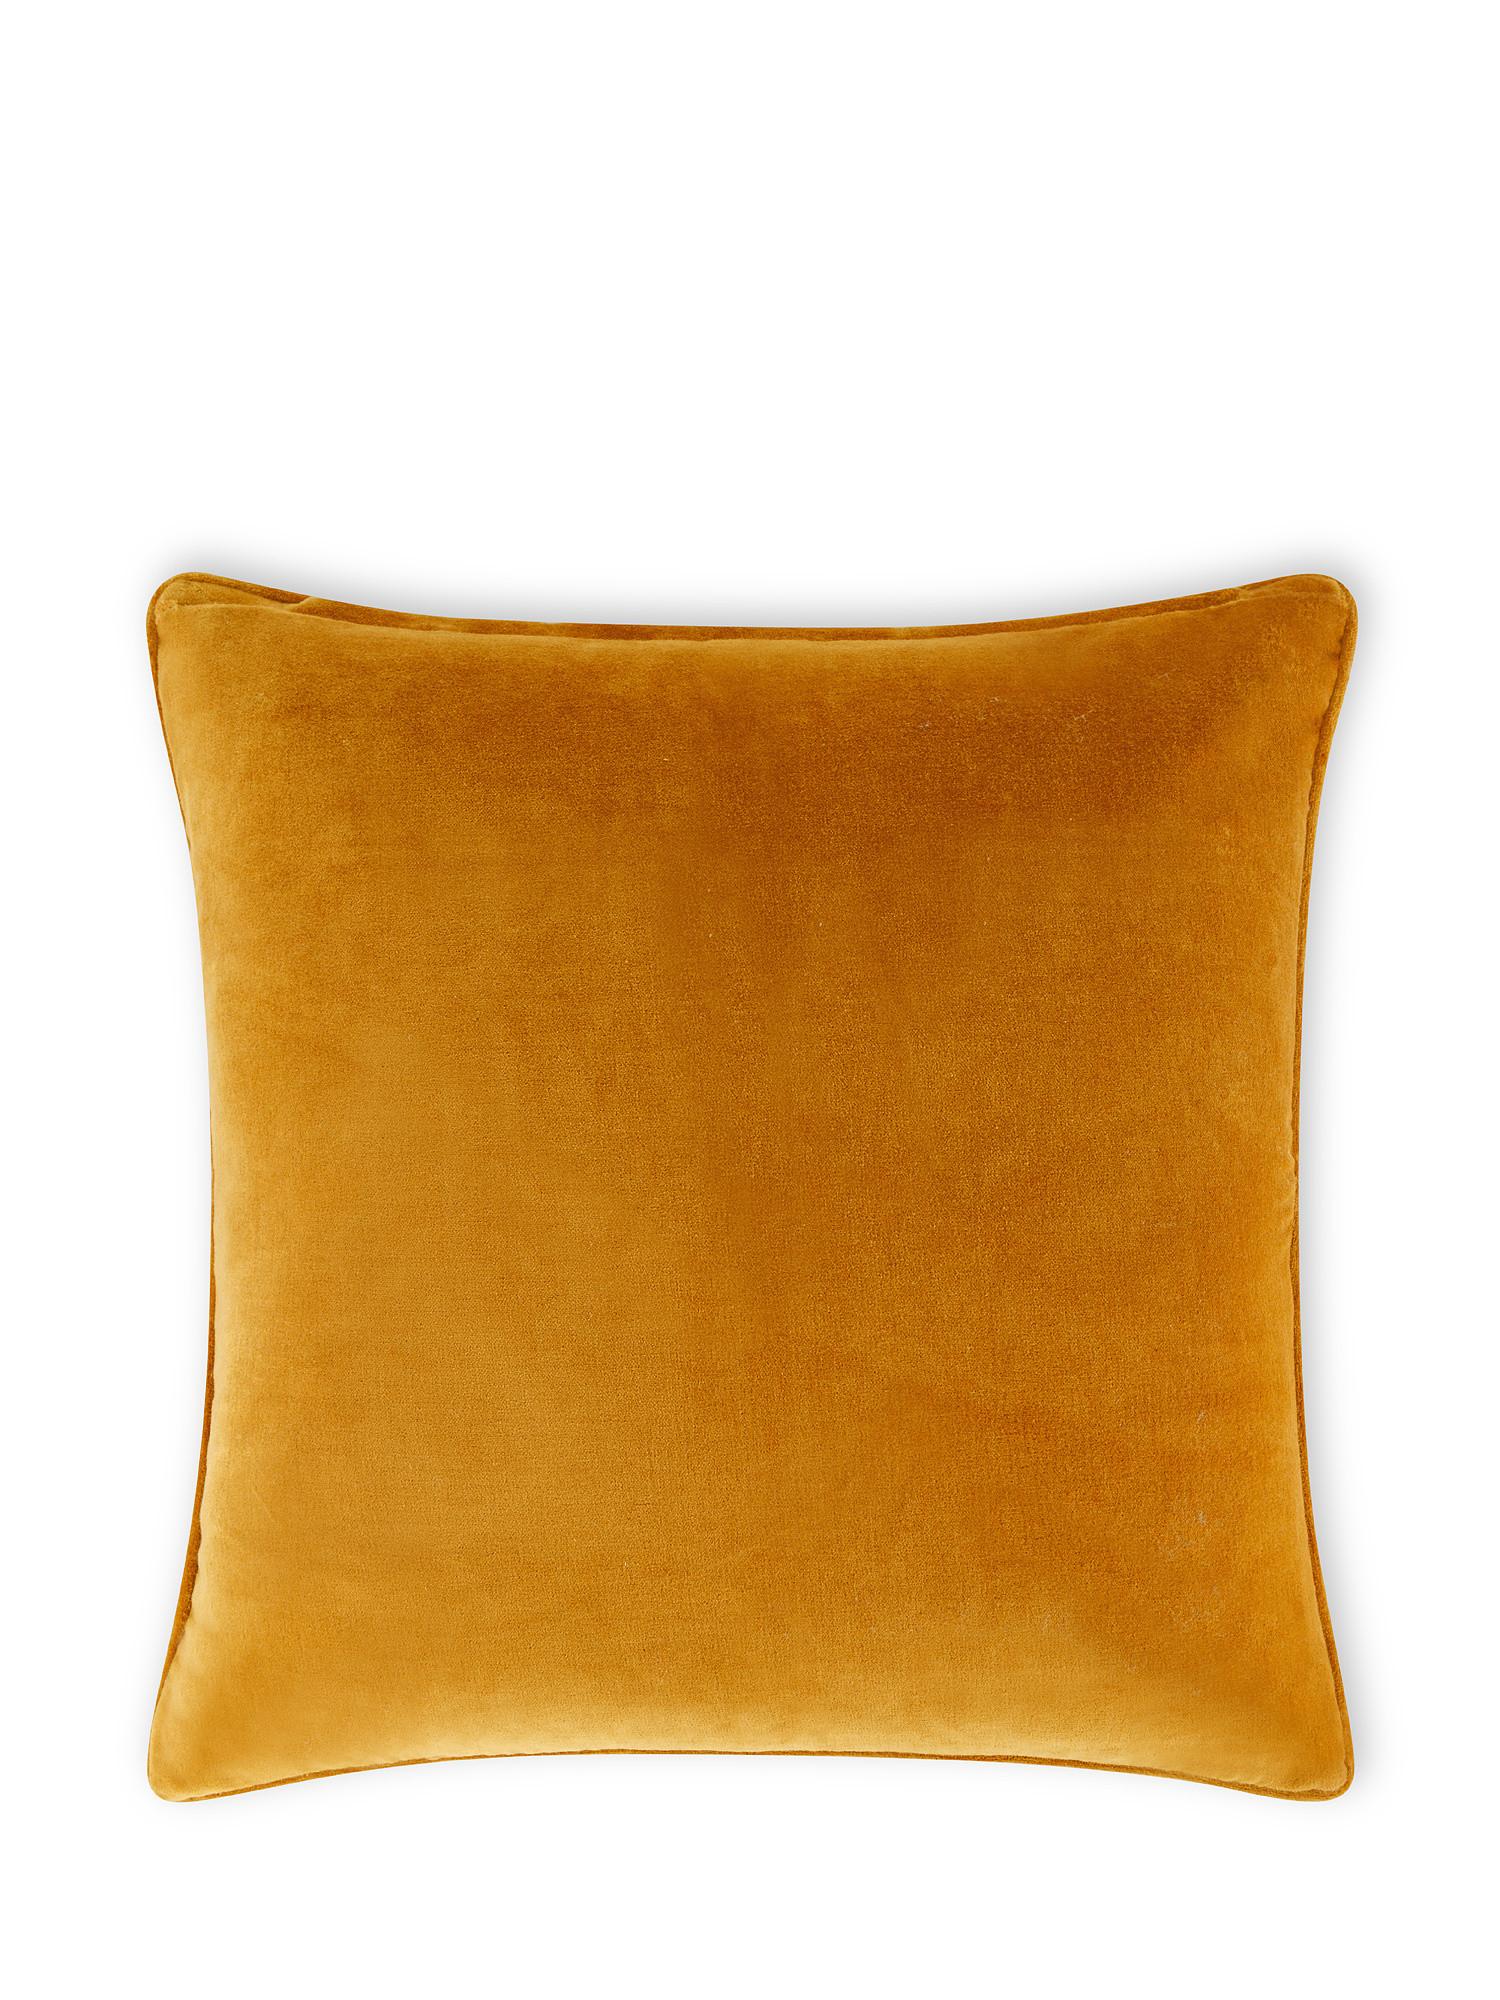 Cuscino velluto di cotone tinta unita 45x45cm, Giallo ocra, large image number 0